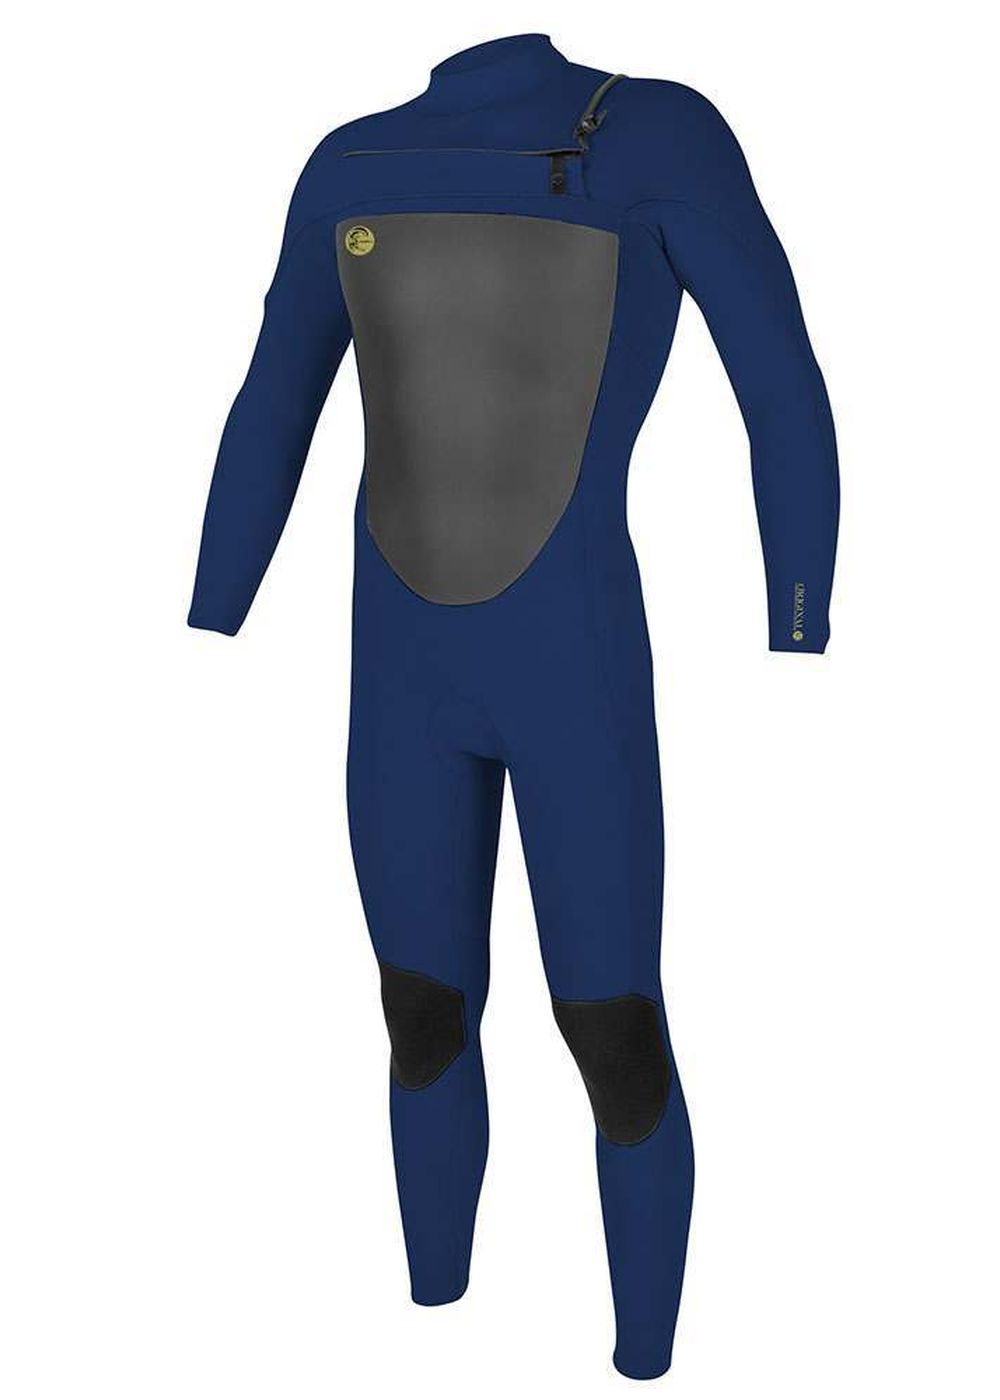 Oneill Original Fz 5/4 Wetsuit 2018 Navy Picture